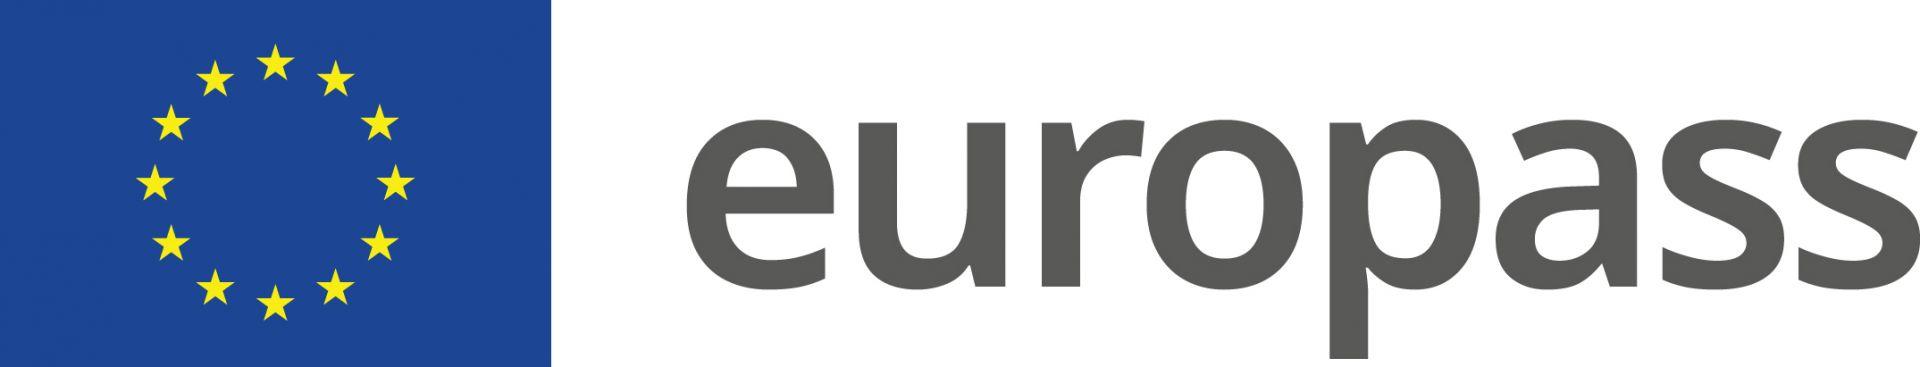 logo-europass-barevne-2020-RGB